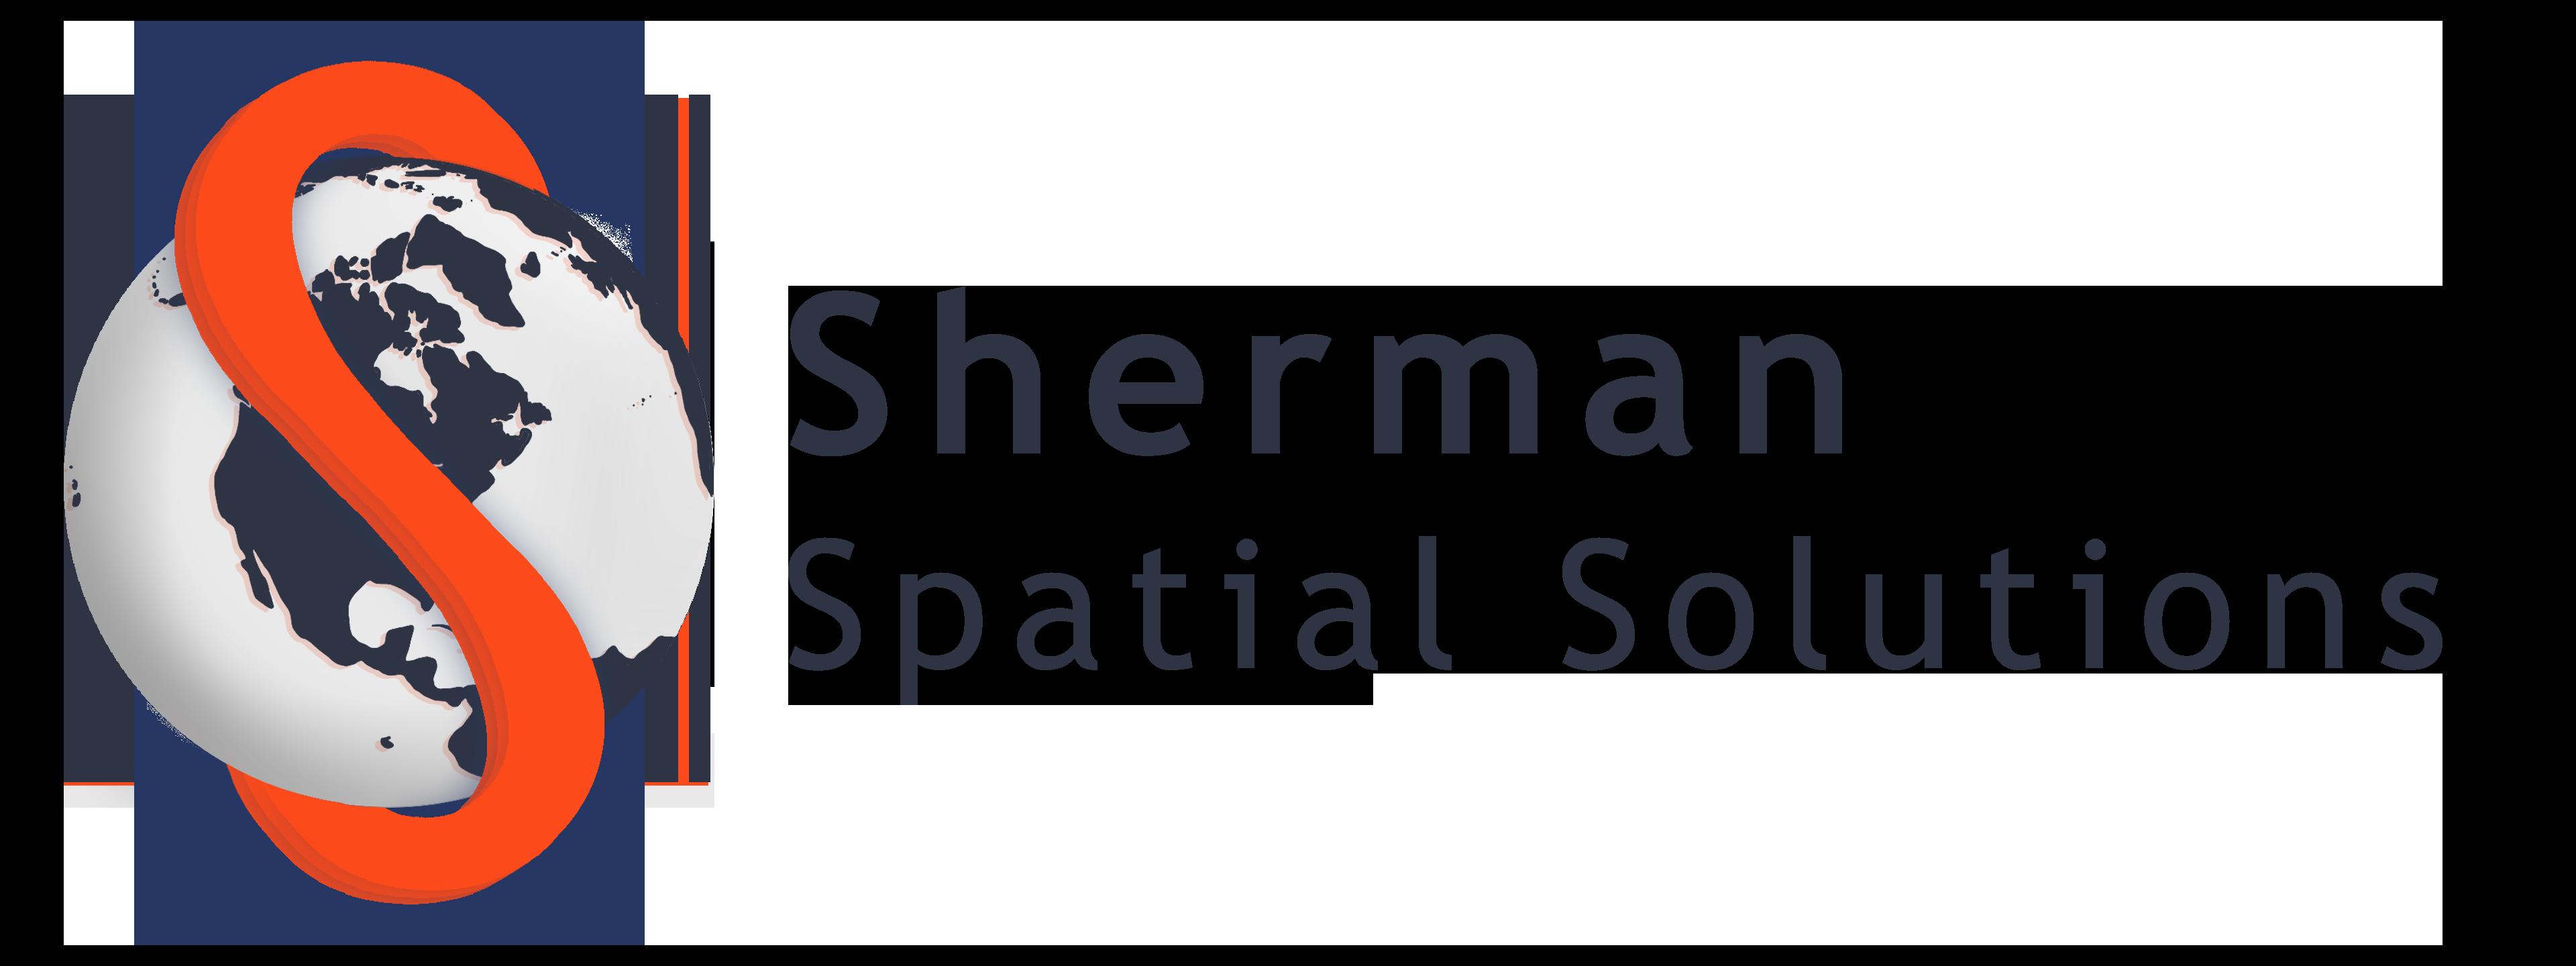 Sherman Spatial Solutions